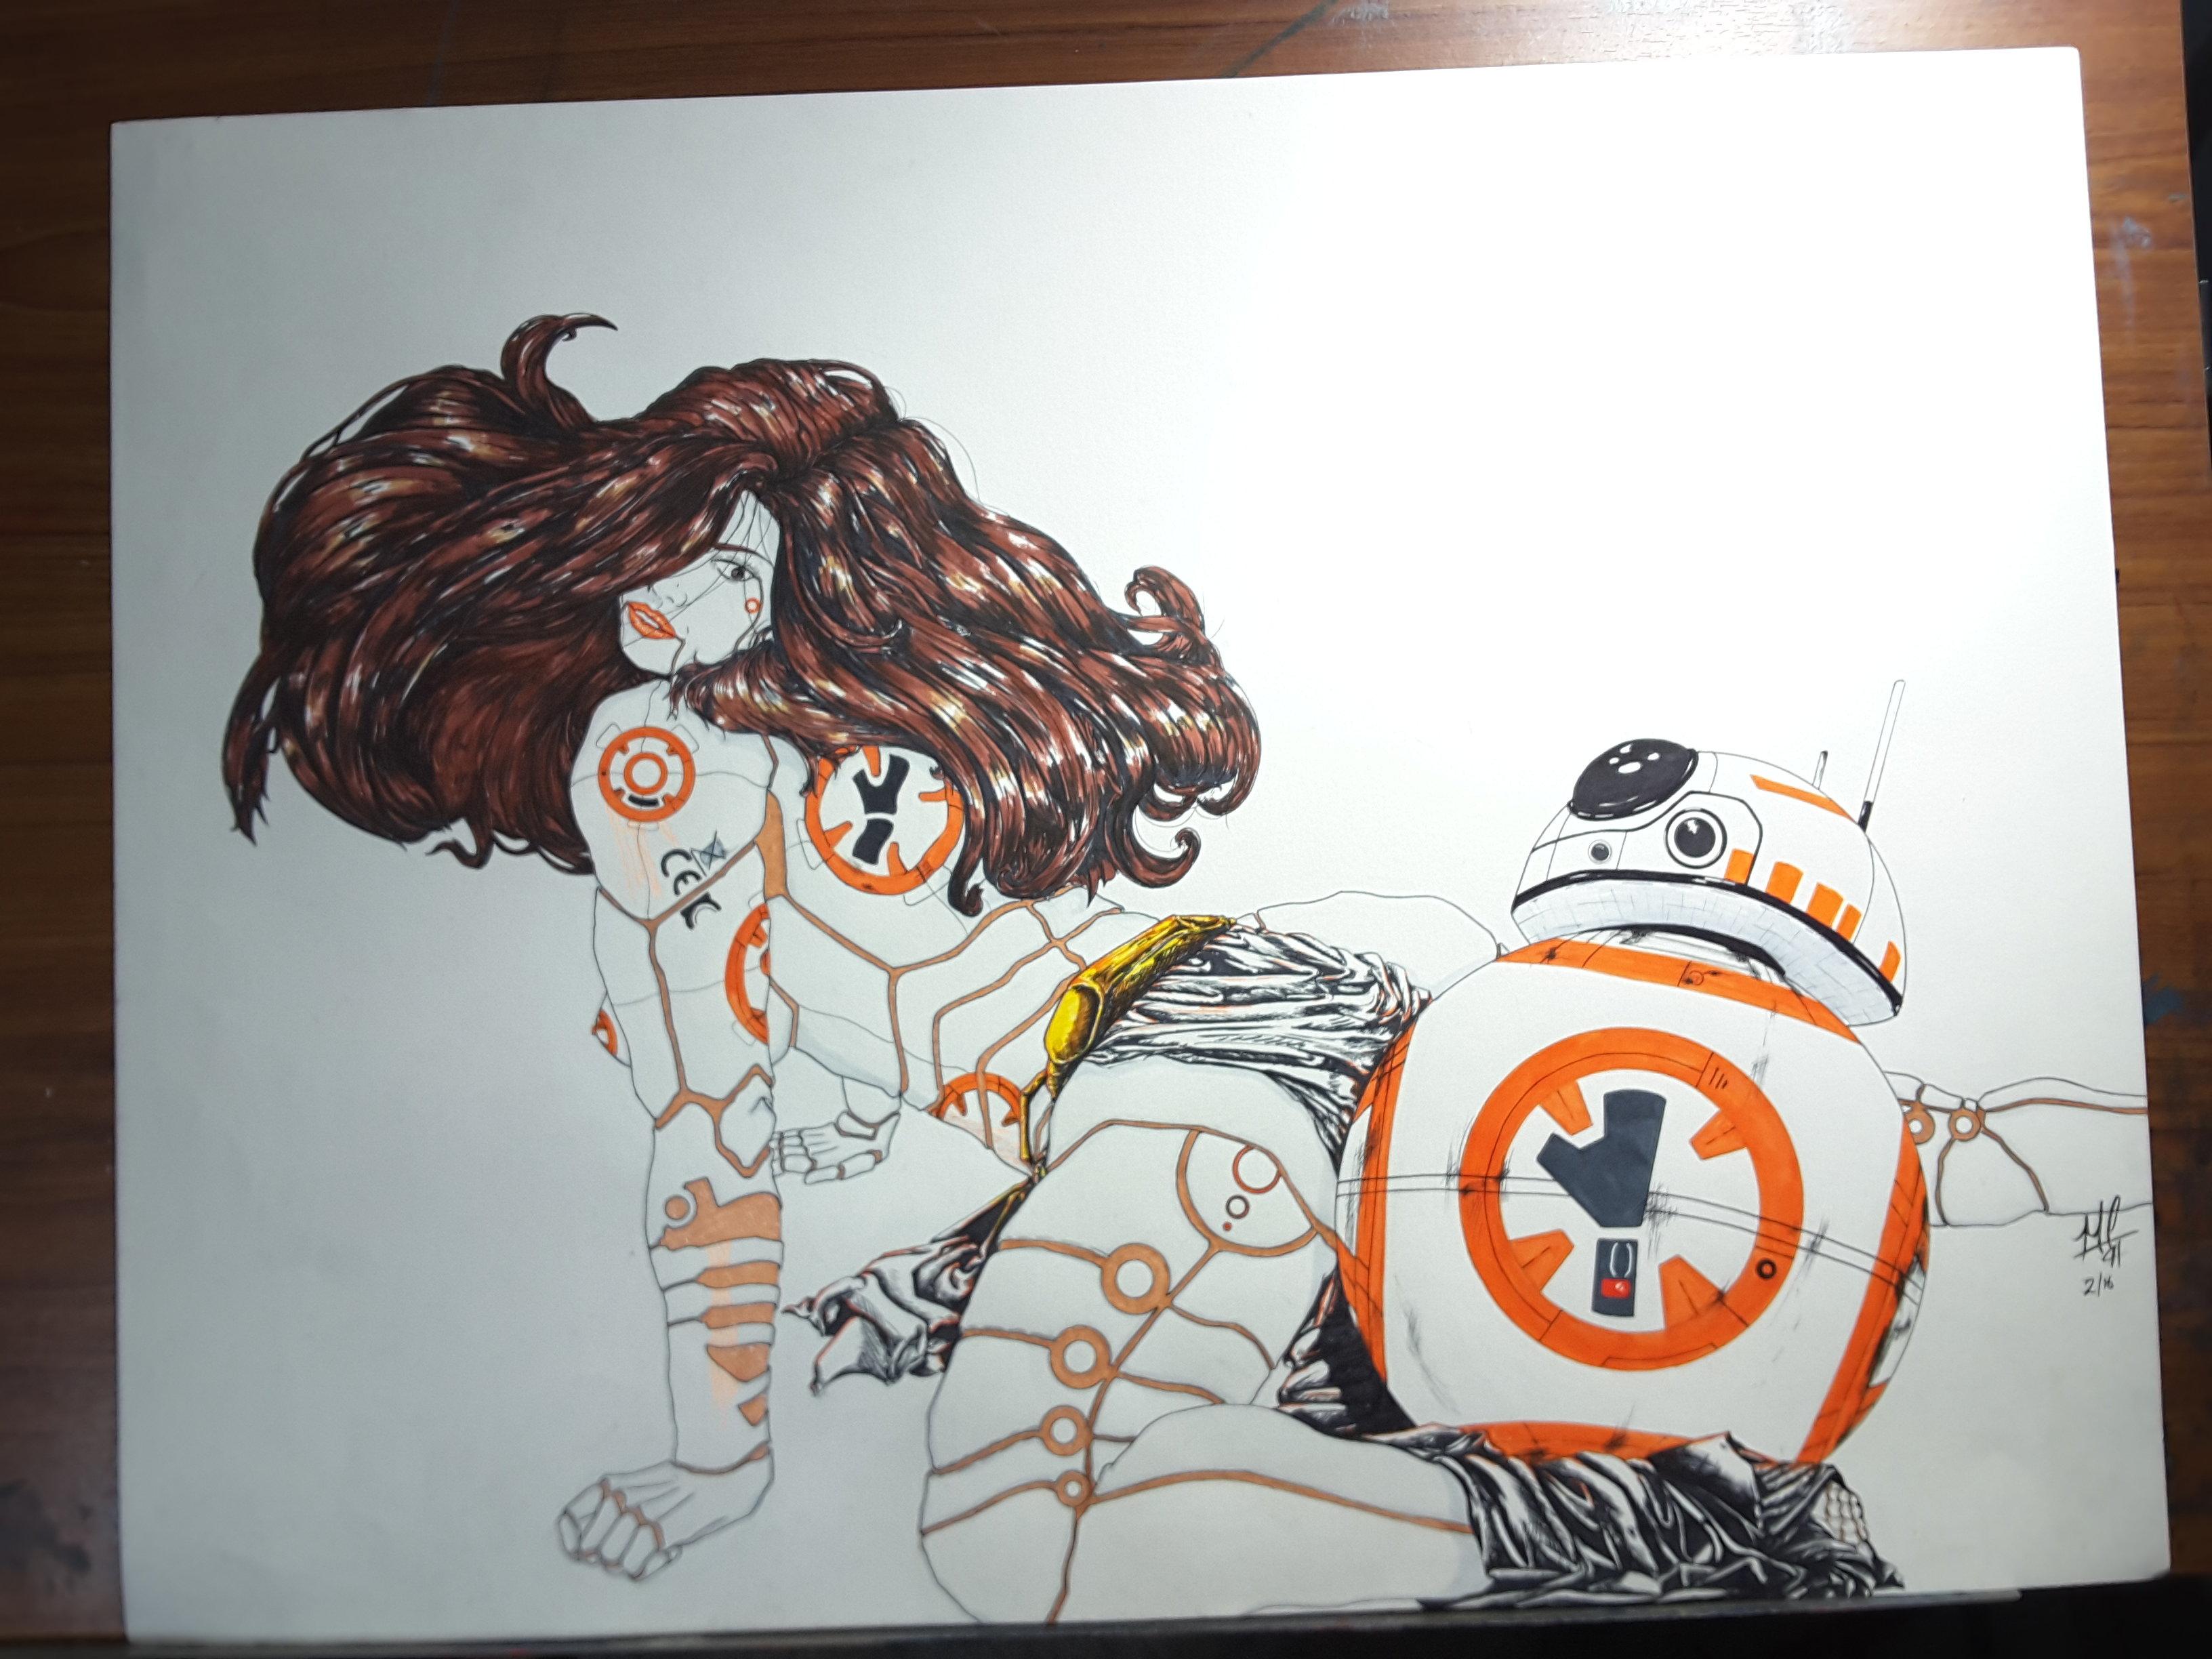 3264x2448 Star Wars Bb 8 Cyborg Drawing